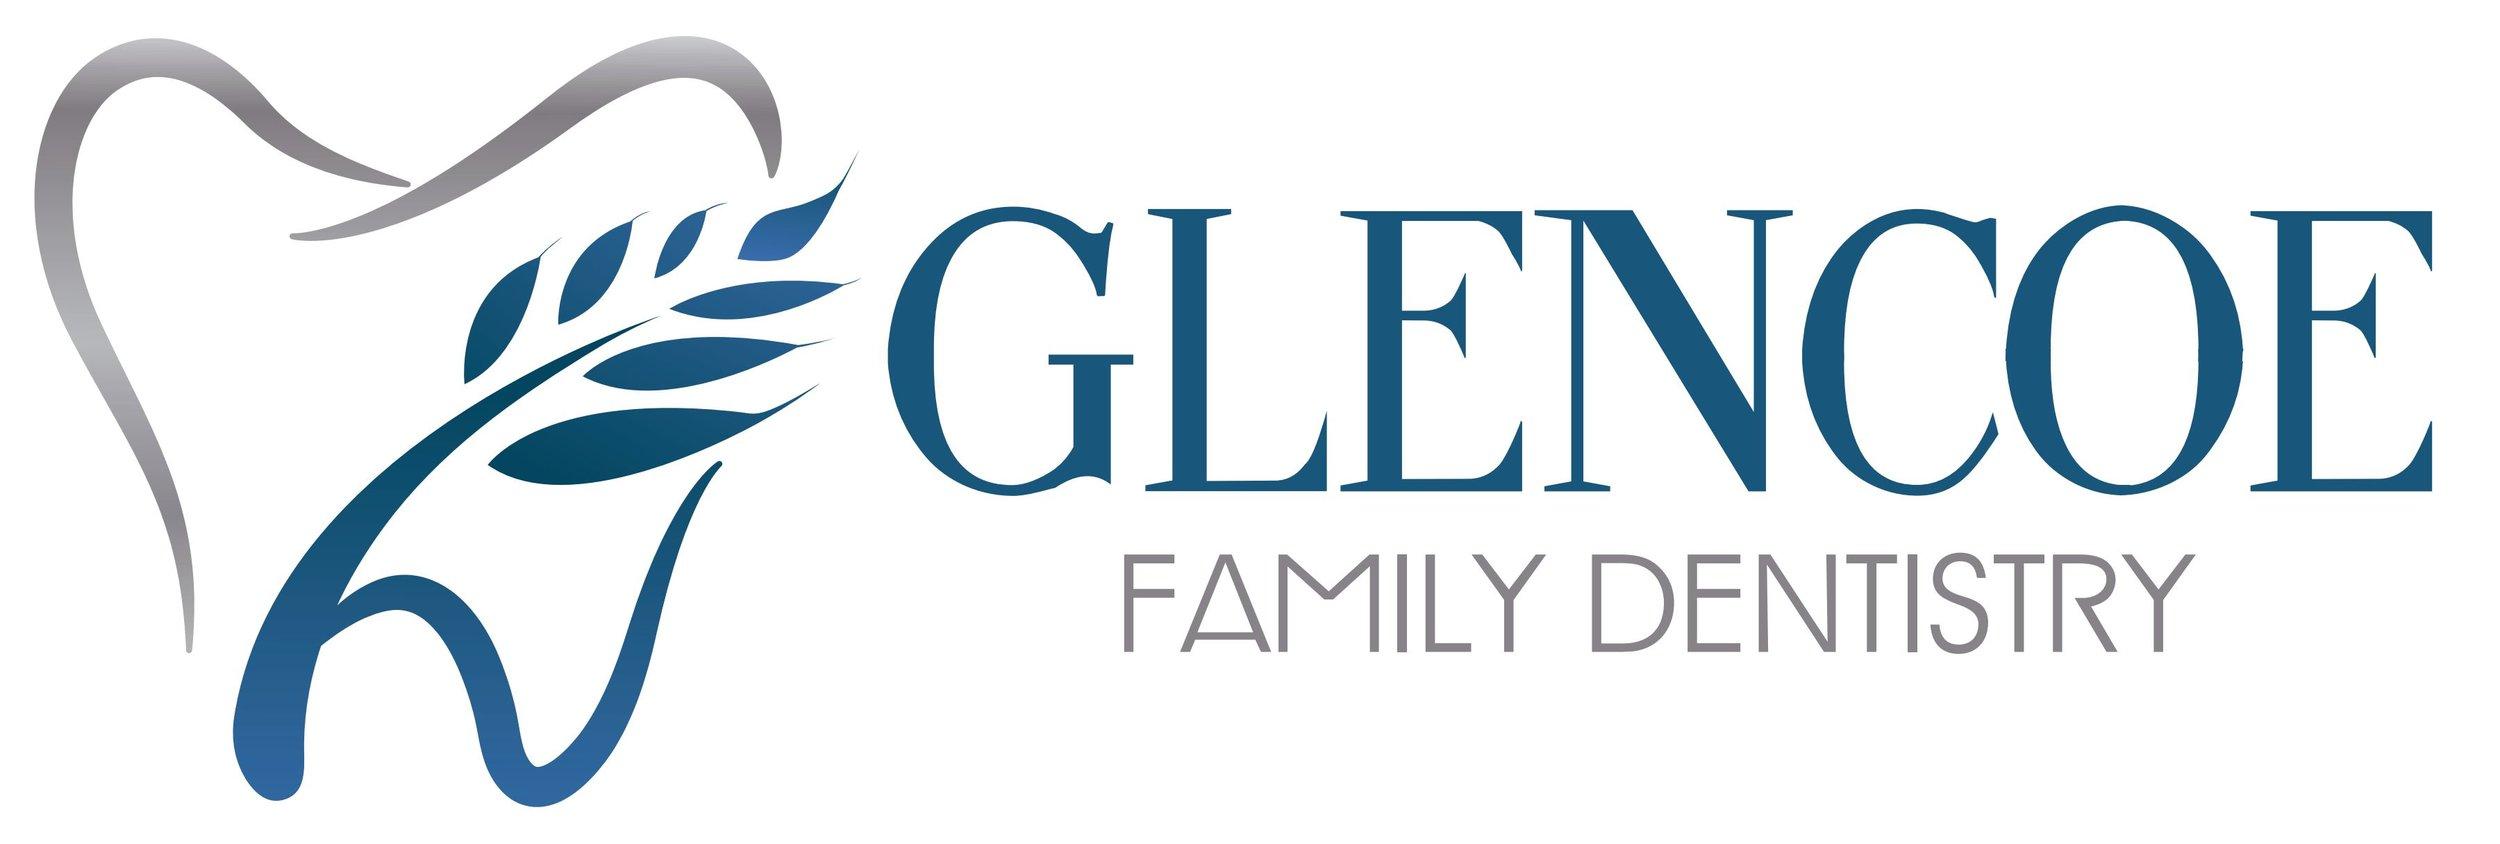 glencoe family dentistry logo.JPG